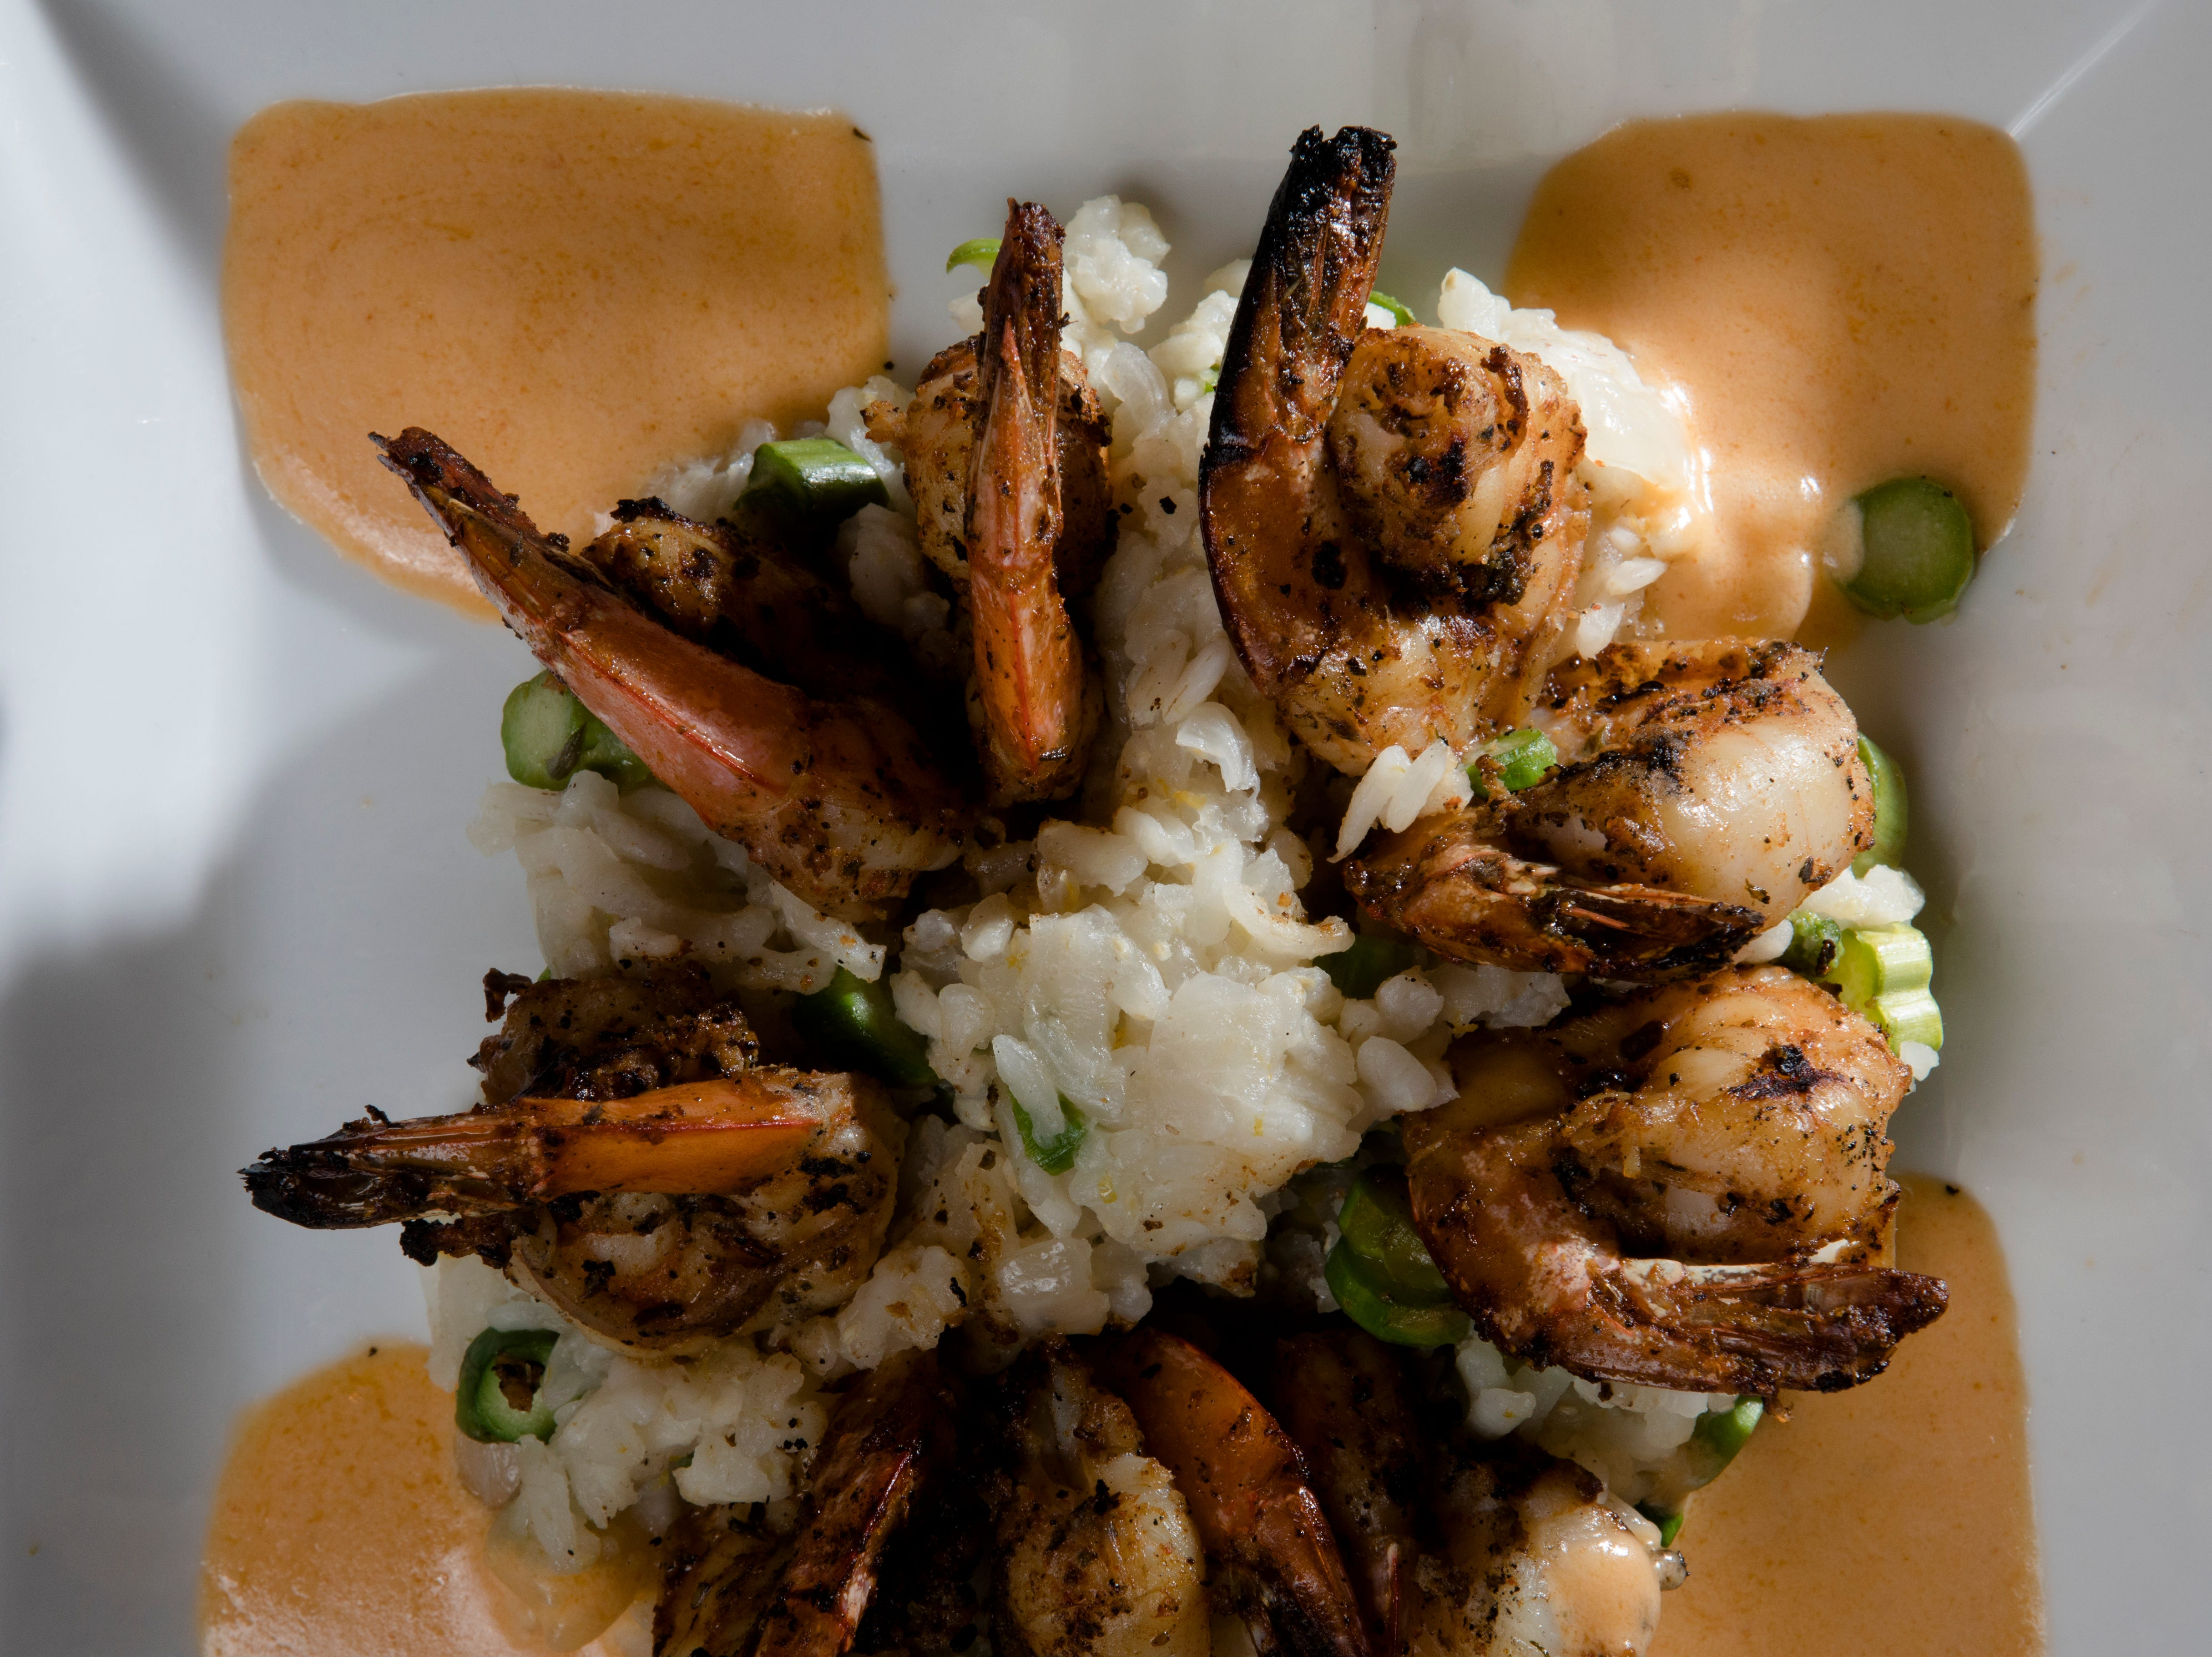 Grilled Shrimp served with citrus risotto, asparagus, char-grilled shrimp, Sriracha cream and mozzarella at Napa kitchen + bar on Friday, Nov. 9, 2018.